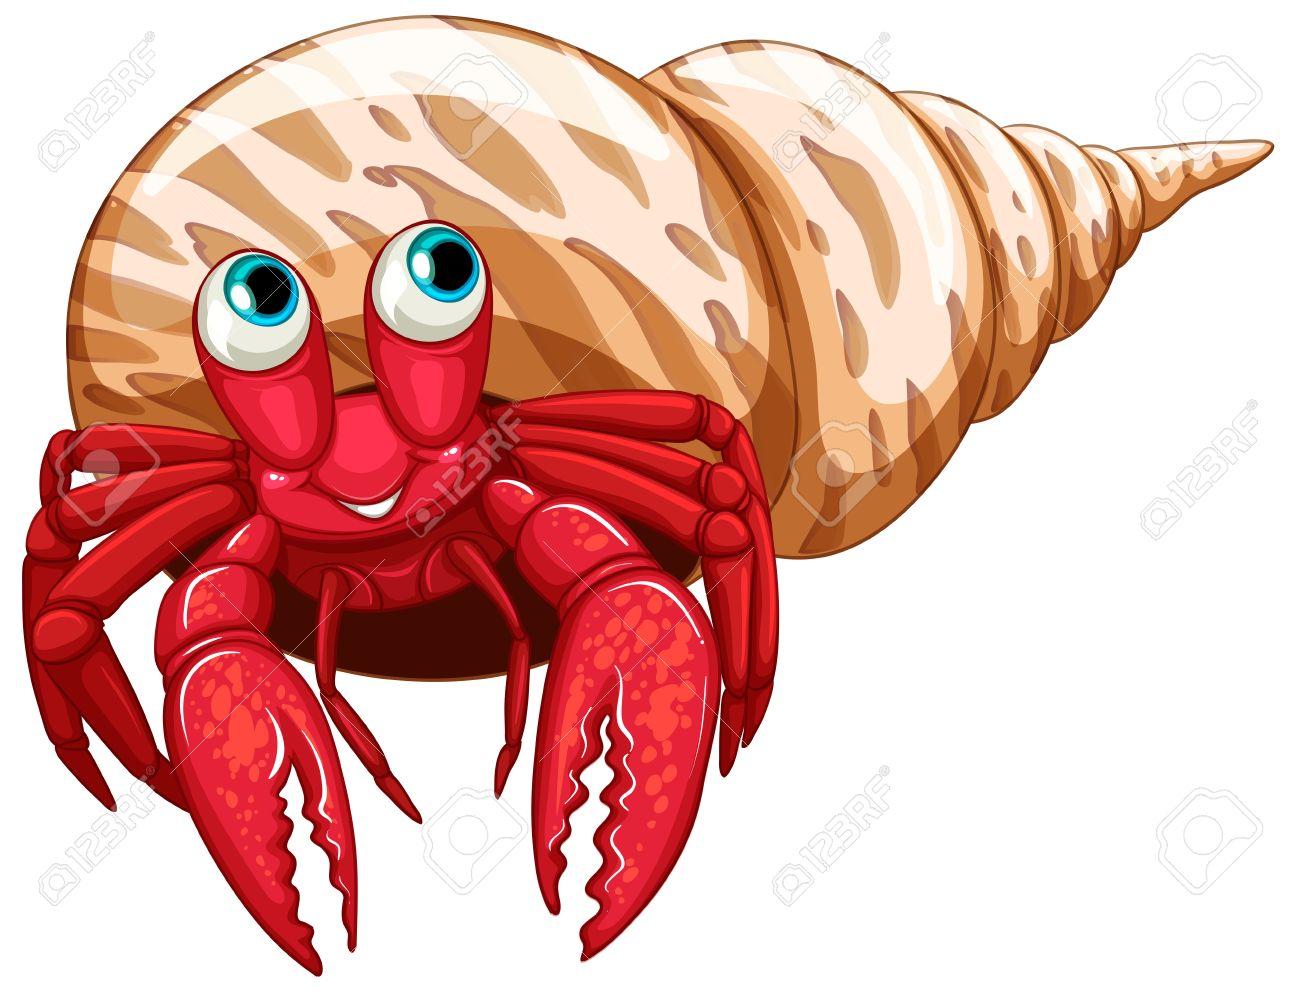 Illustration of a single hermit crab.